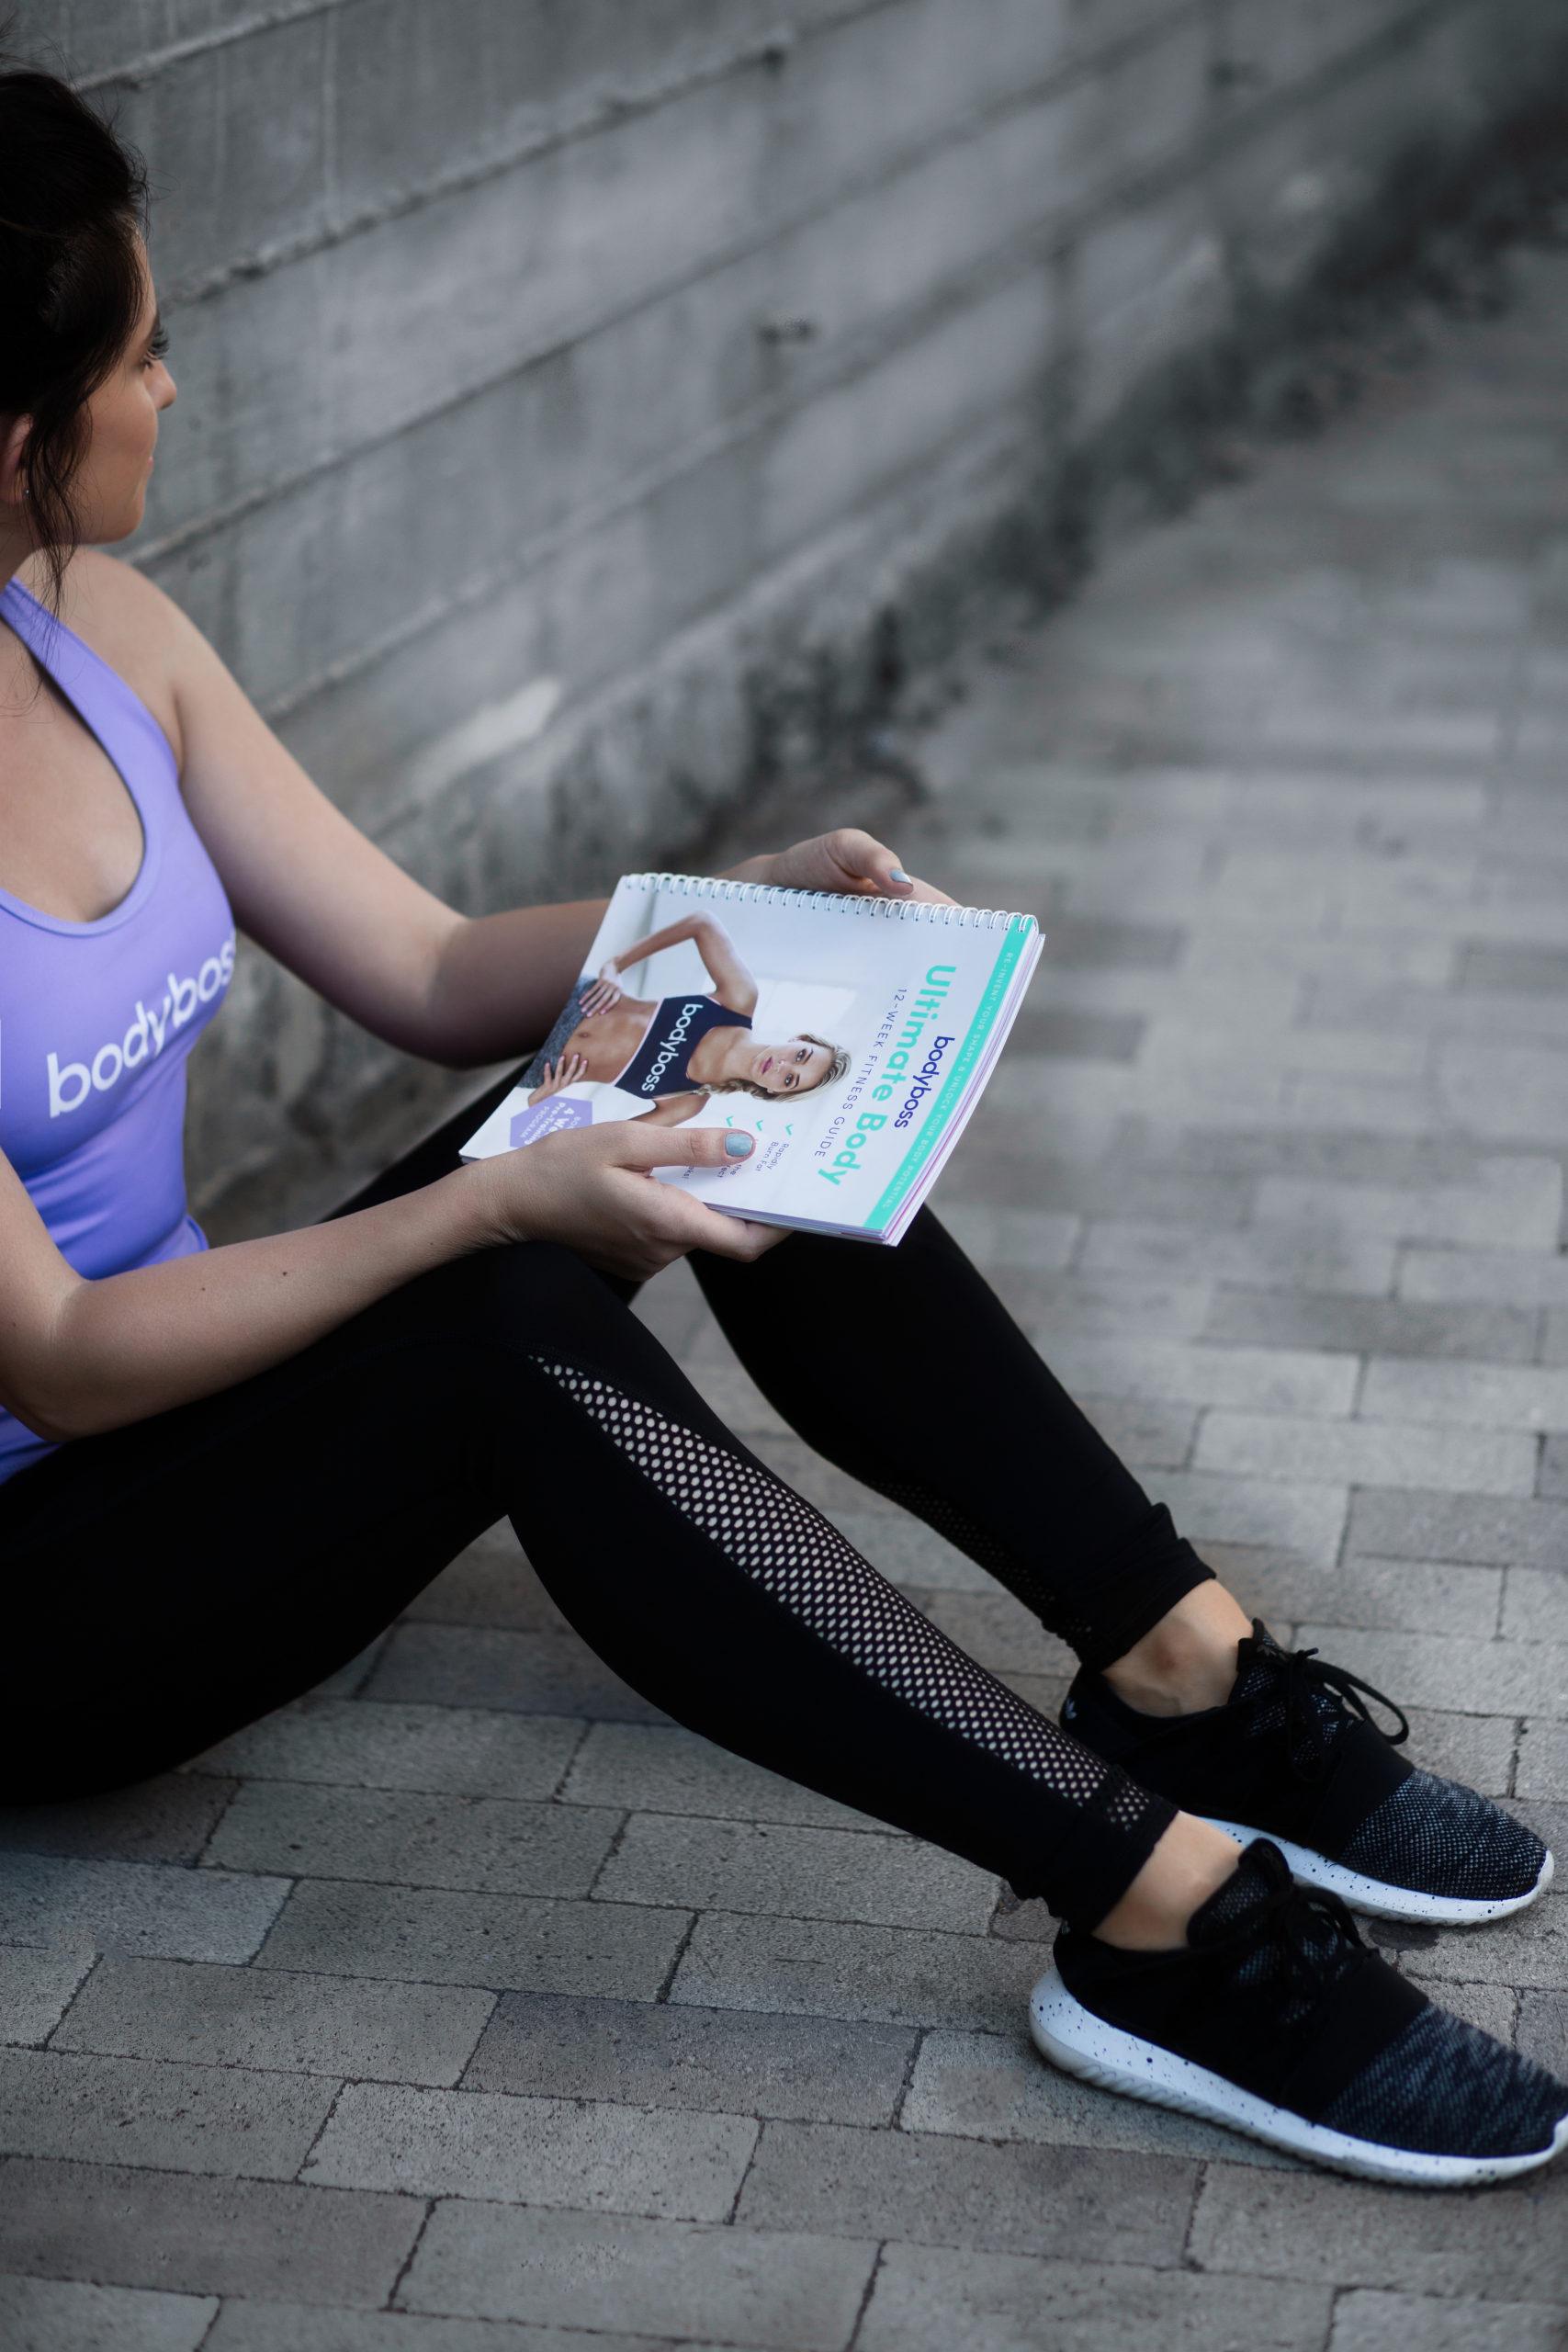 Body Boss Workout Program